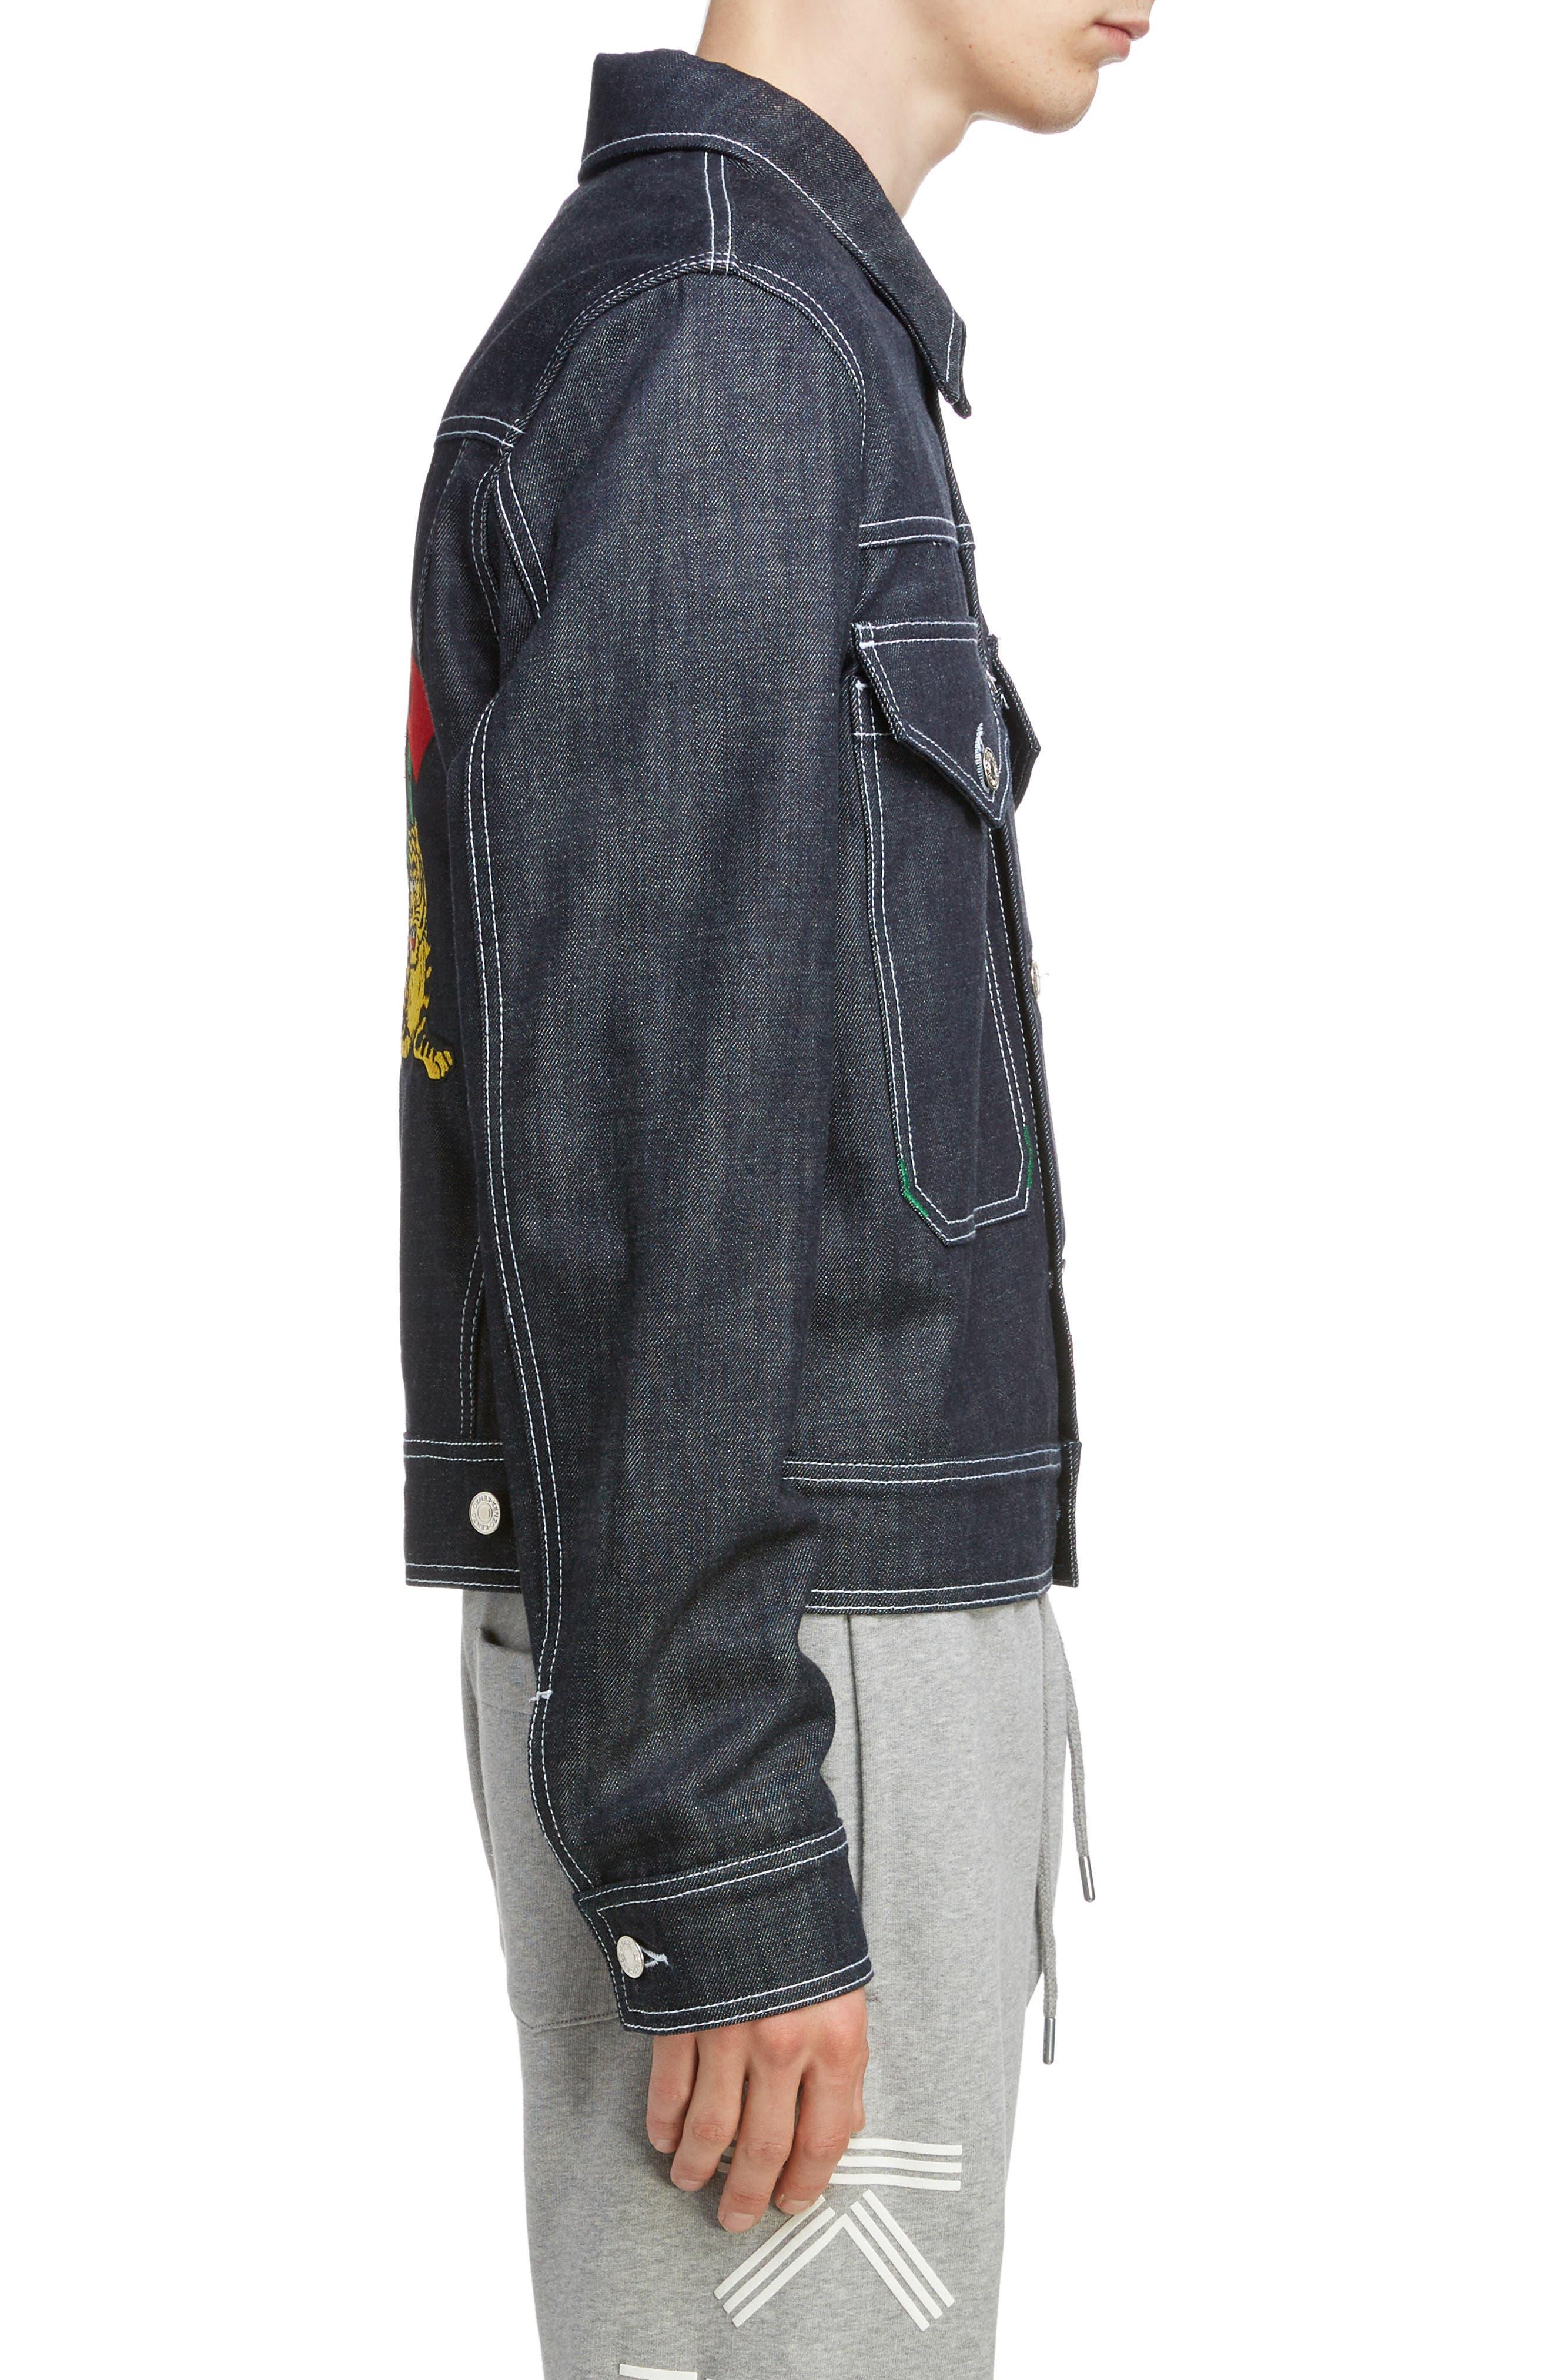 KENZO, Jumping Tiger Embroidered Denim Jacket, Alternate thumbnail 3, color, NAVY BLUE